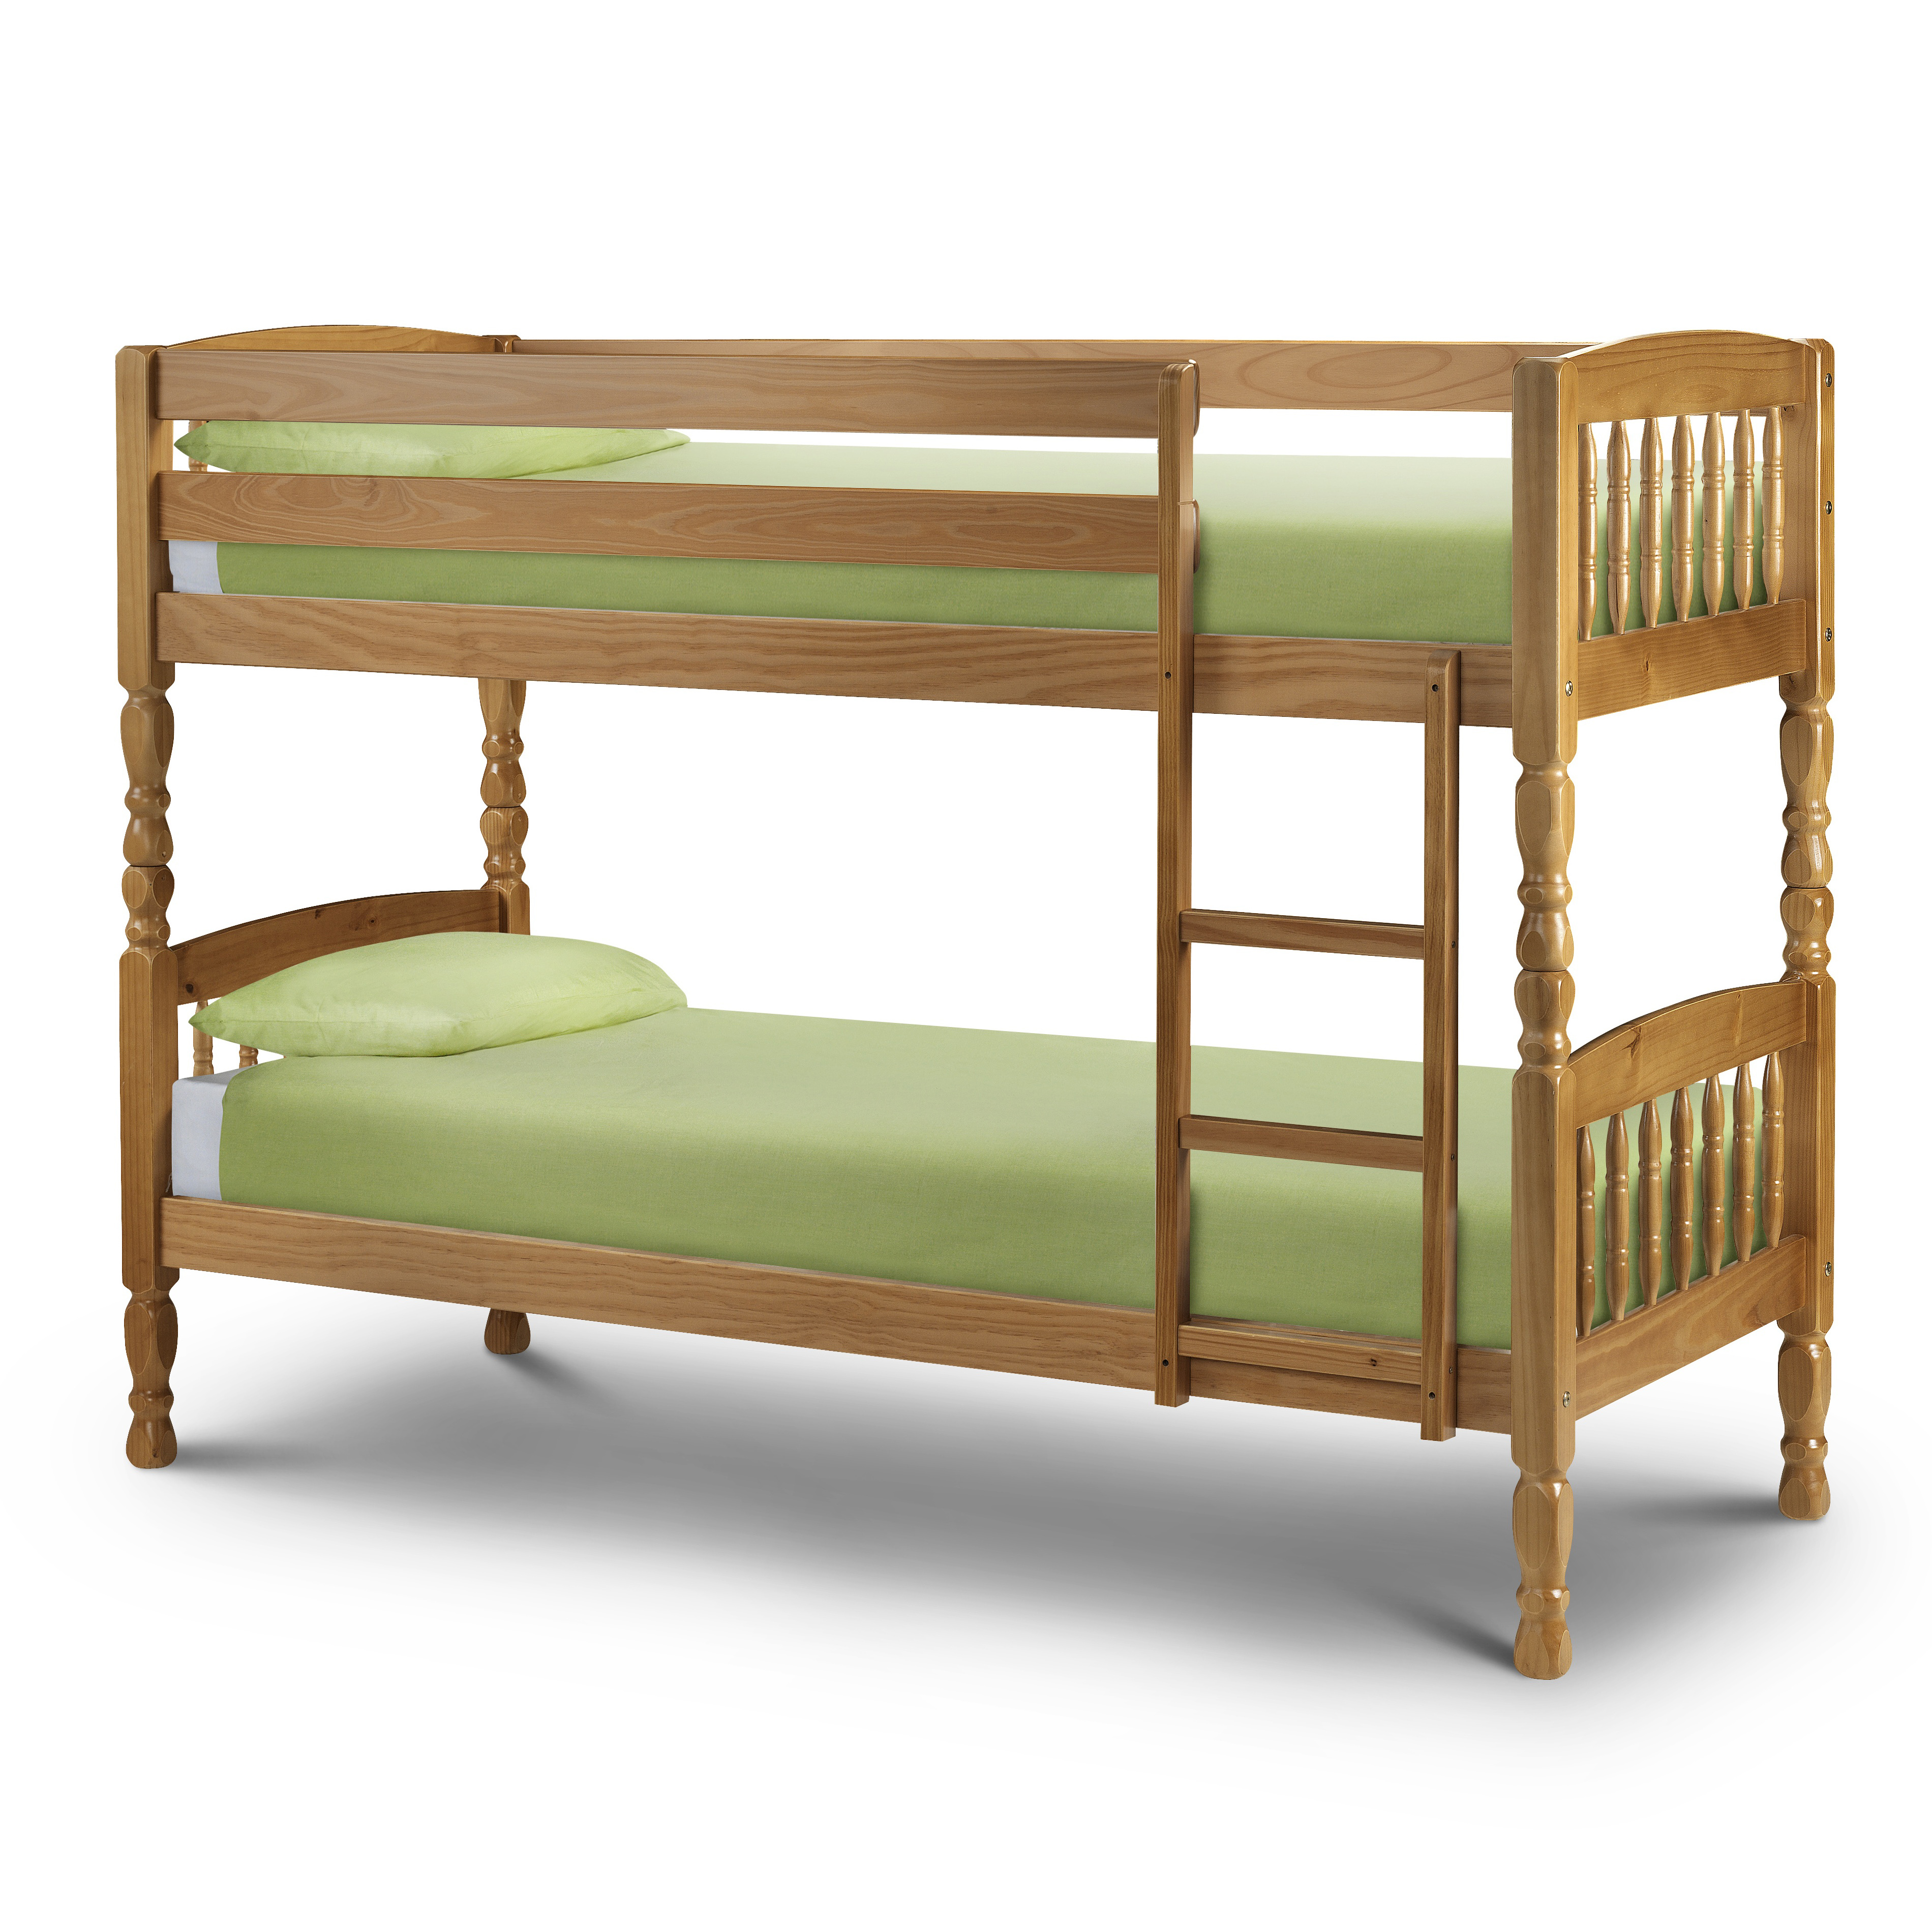 Shop Beds Online: Julian Bowen Lincoln Bunk Bed